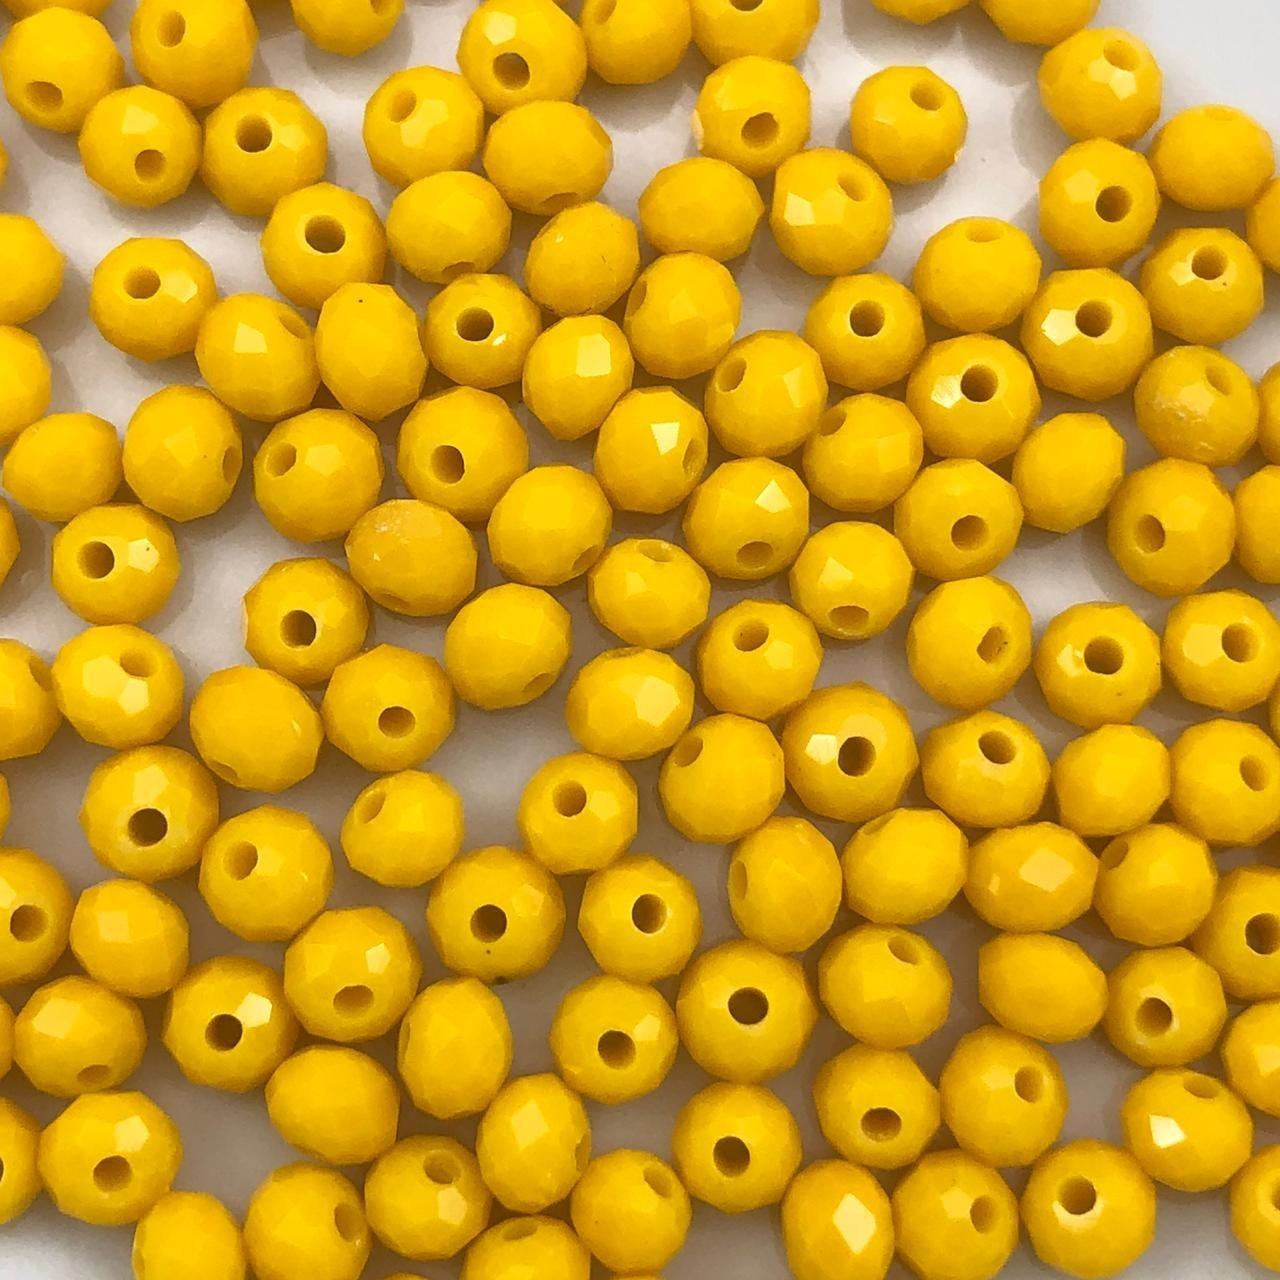 CRT118 - Cristal Amarelo Gema 4mm - 150Unids